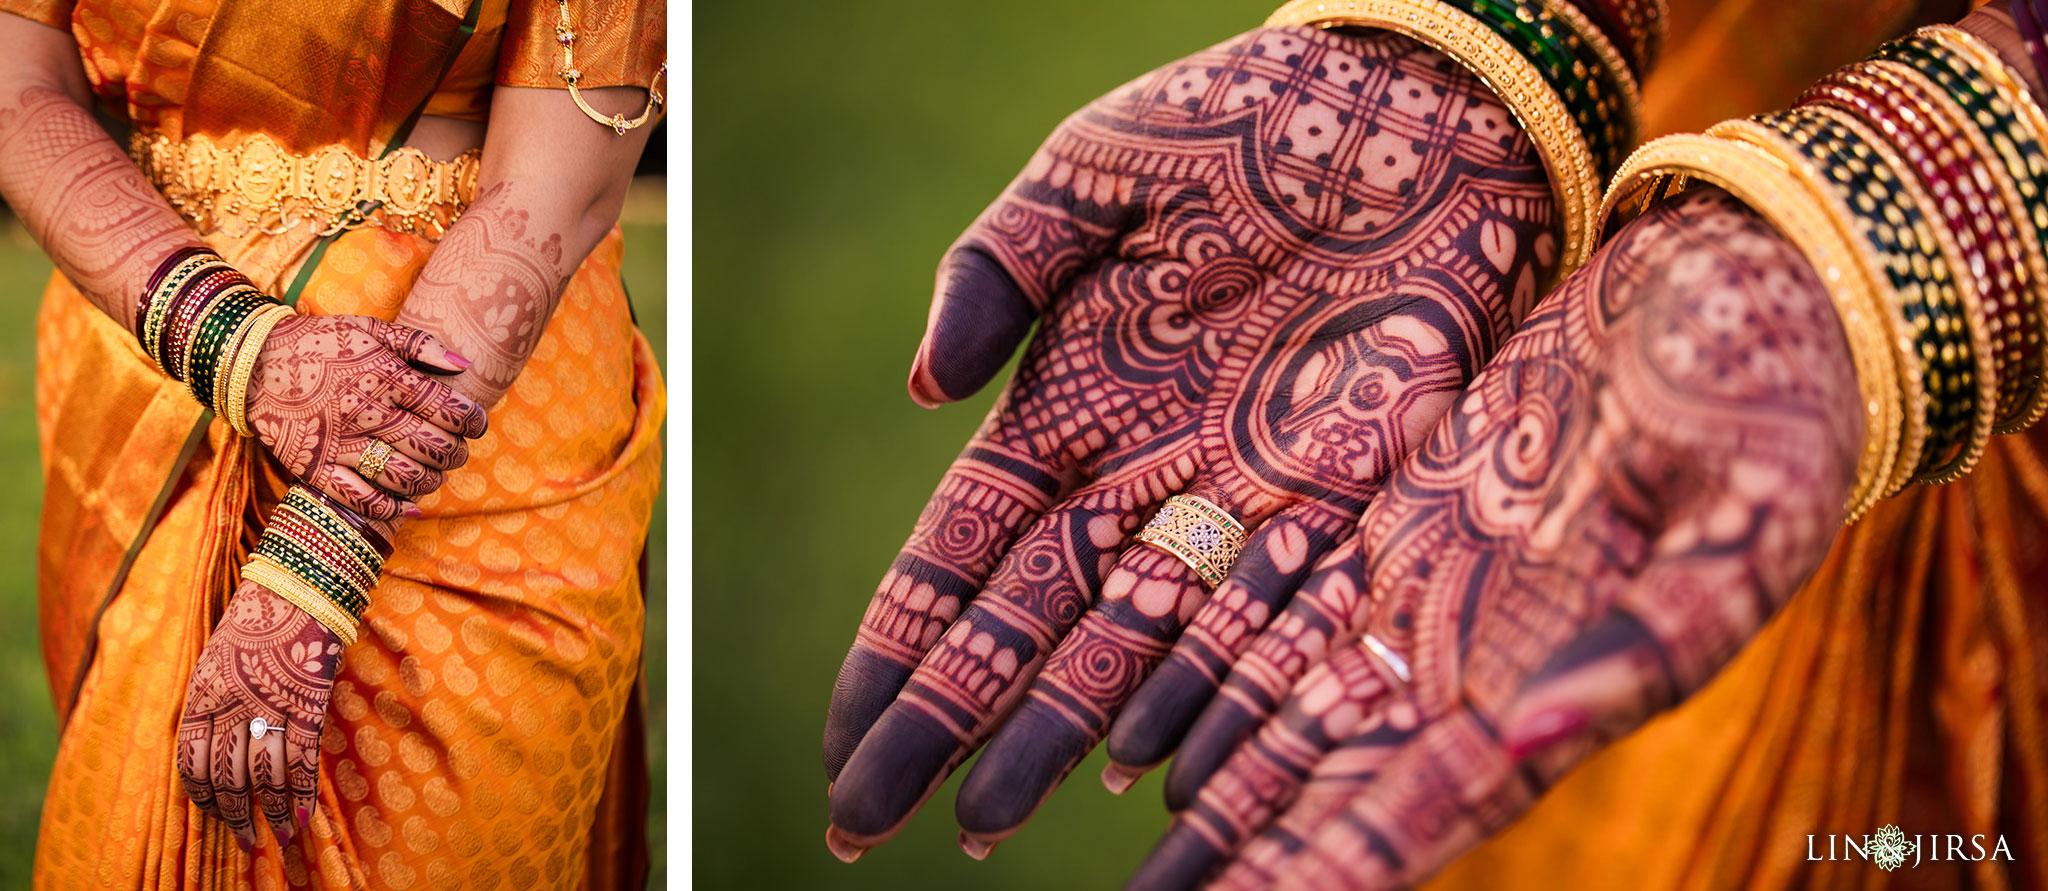 04 long beach hyatt south indian wedding photography